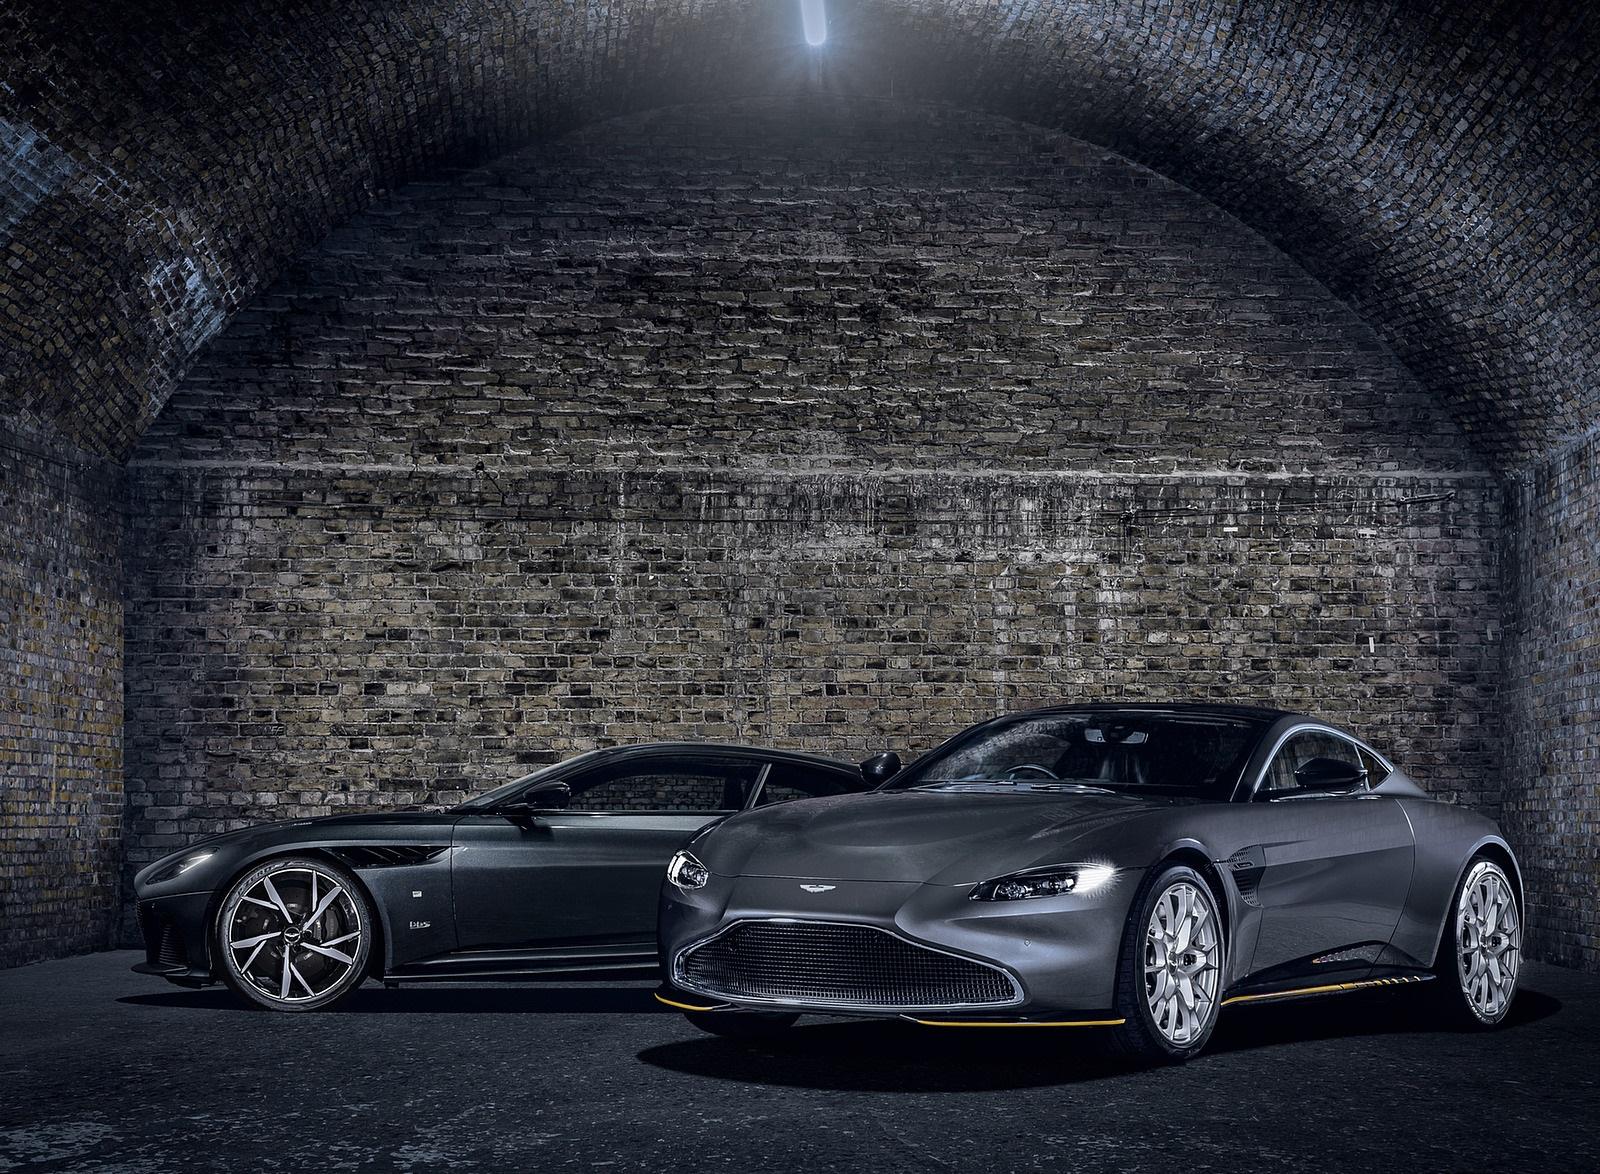 2021 Aston Martin Vantage 007 Edition and DBS Superleggera 007 Edition Wallpapers (7)